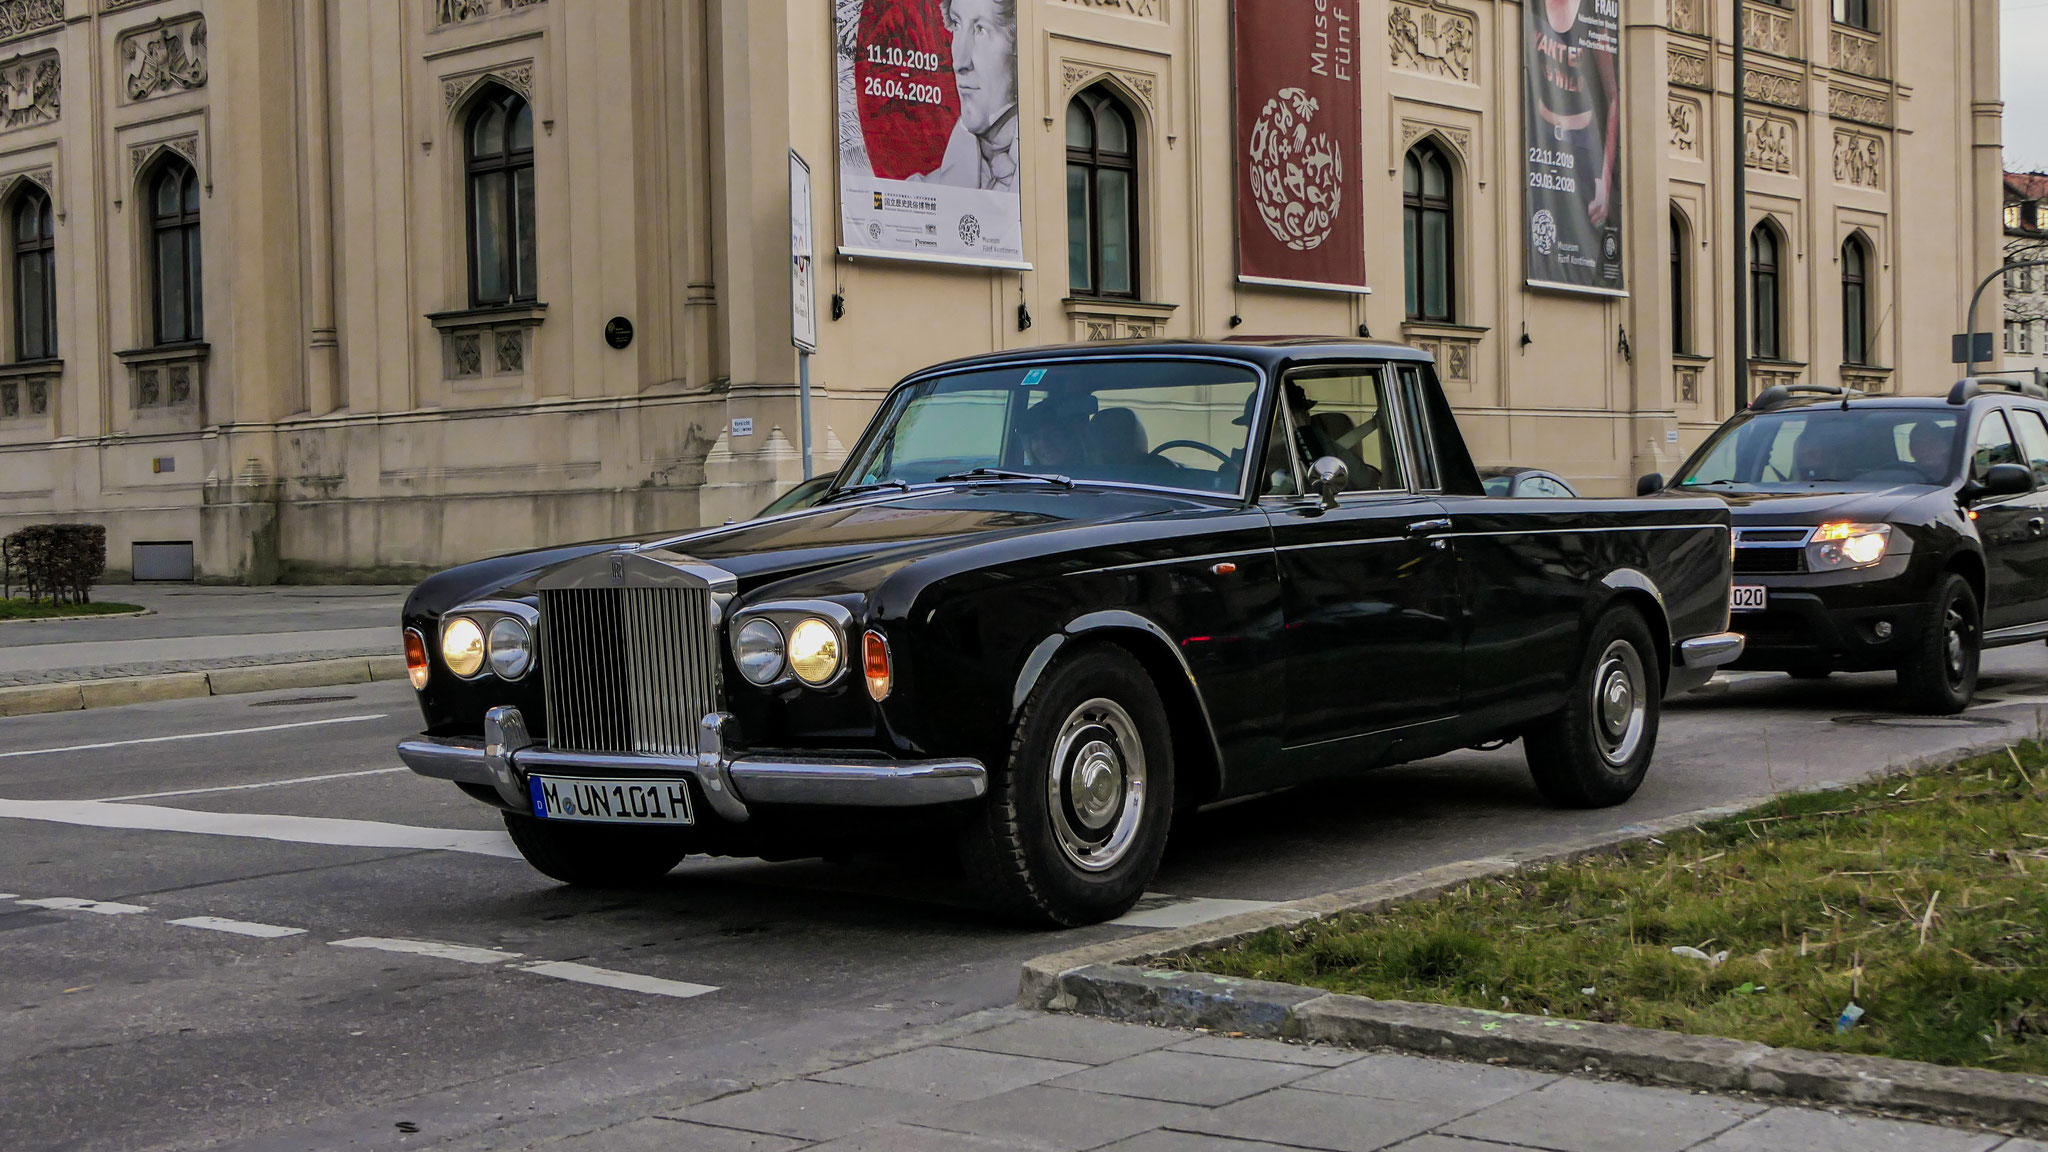 Rolls Royce Silver Shadow Pickup - M-UN-101H